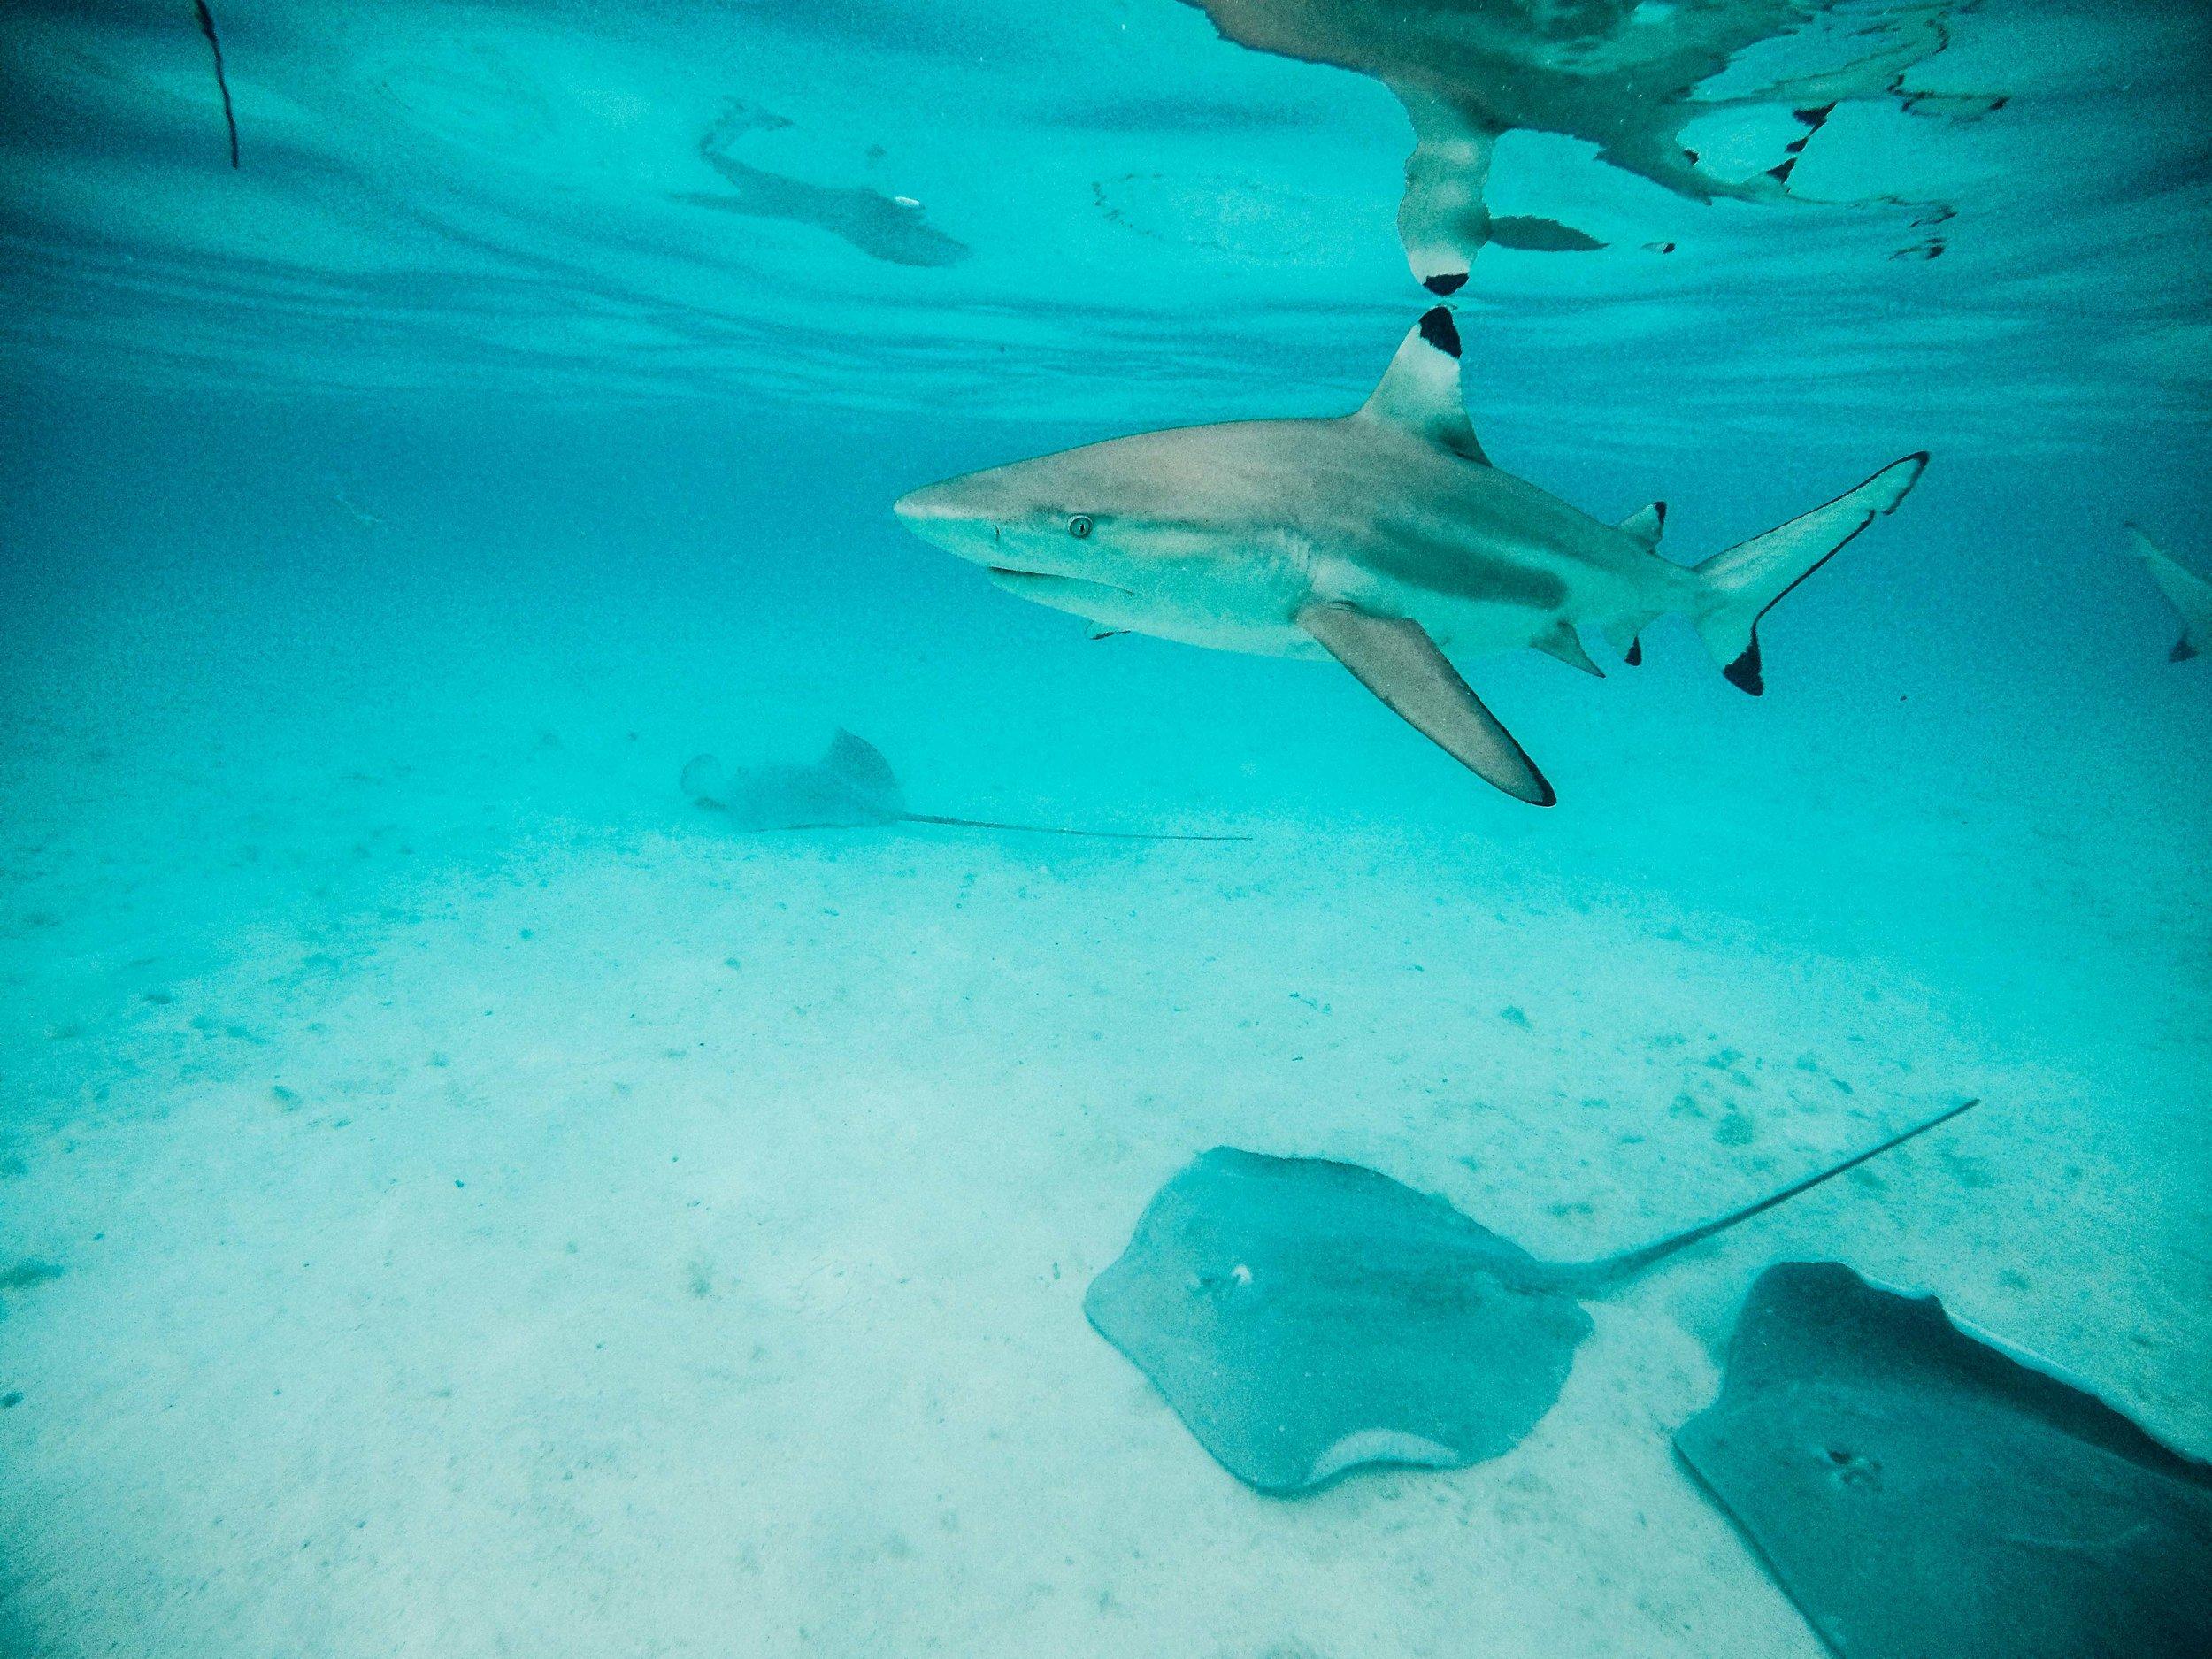 shark_tahiti_frenchpolynesia.jpg